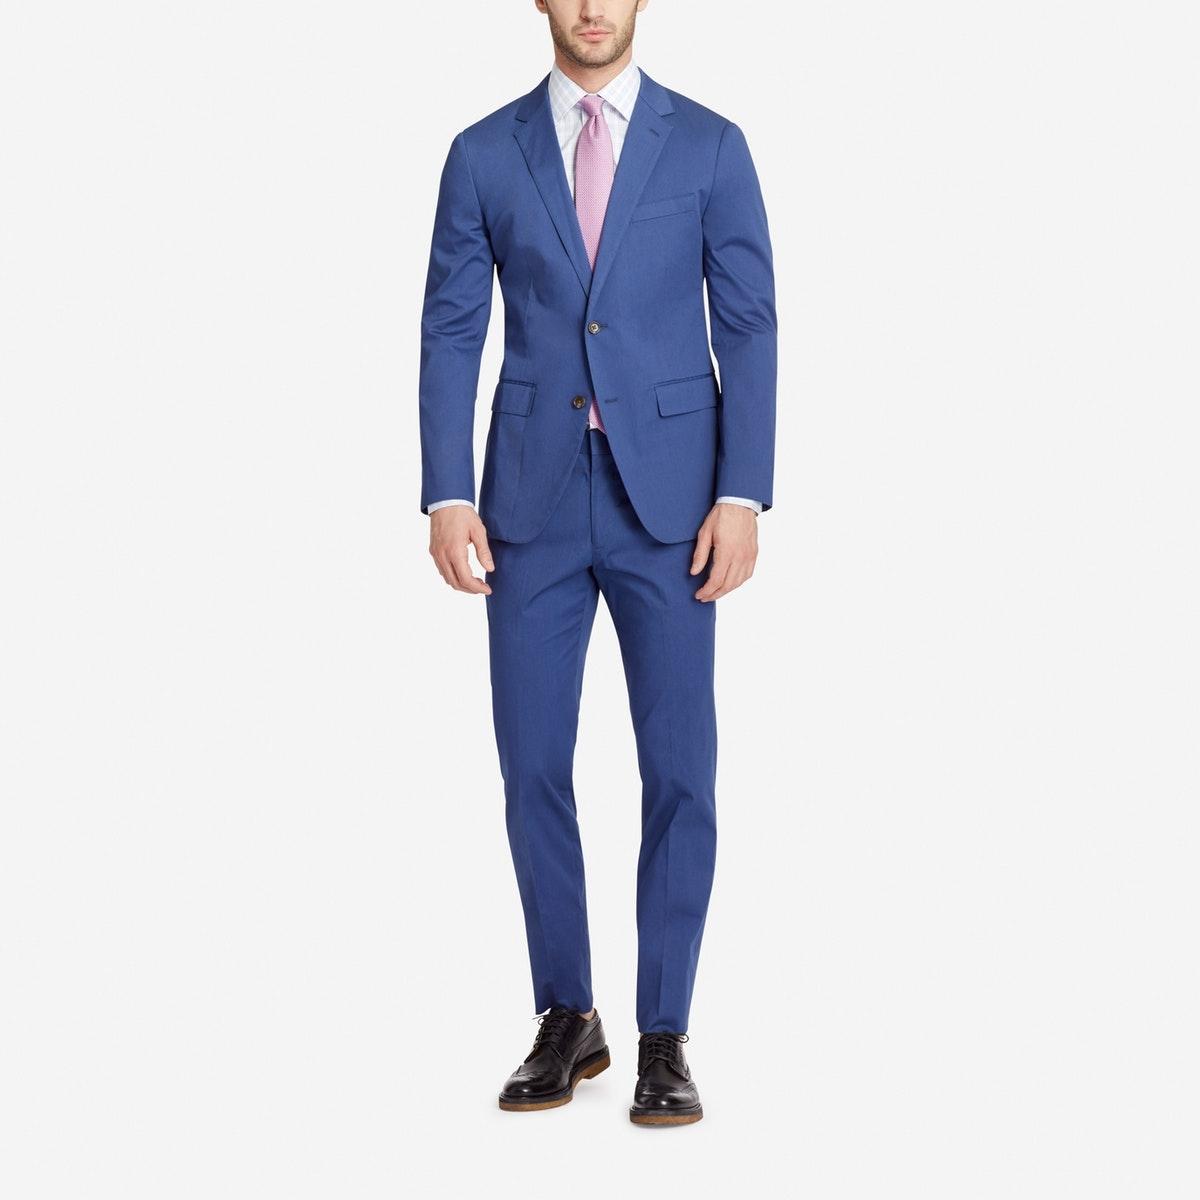 Jetsetter Stretch Italian Cotton Suit